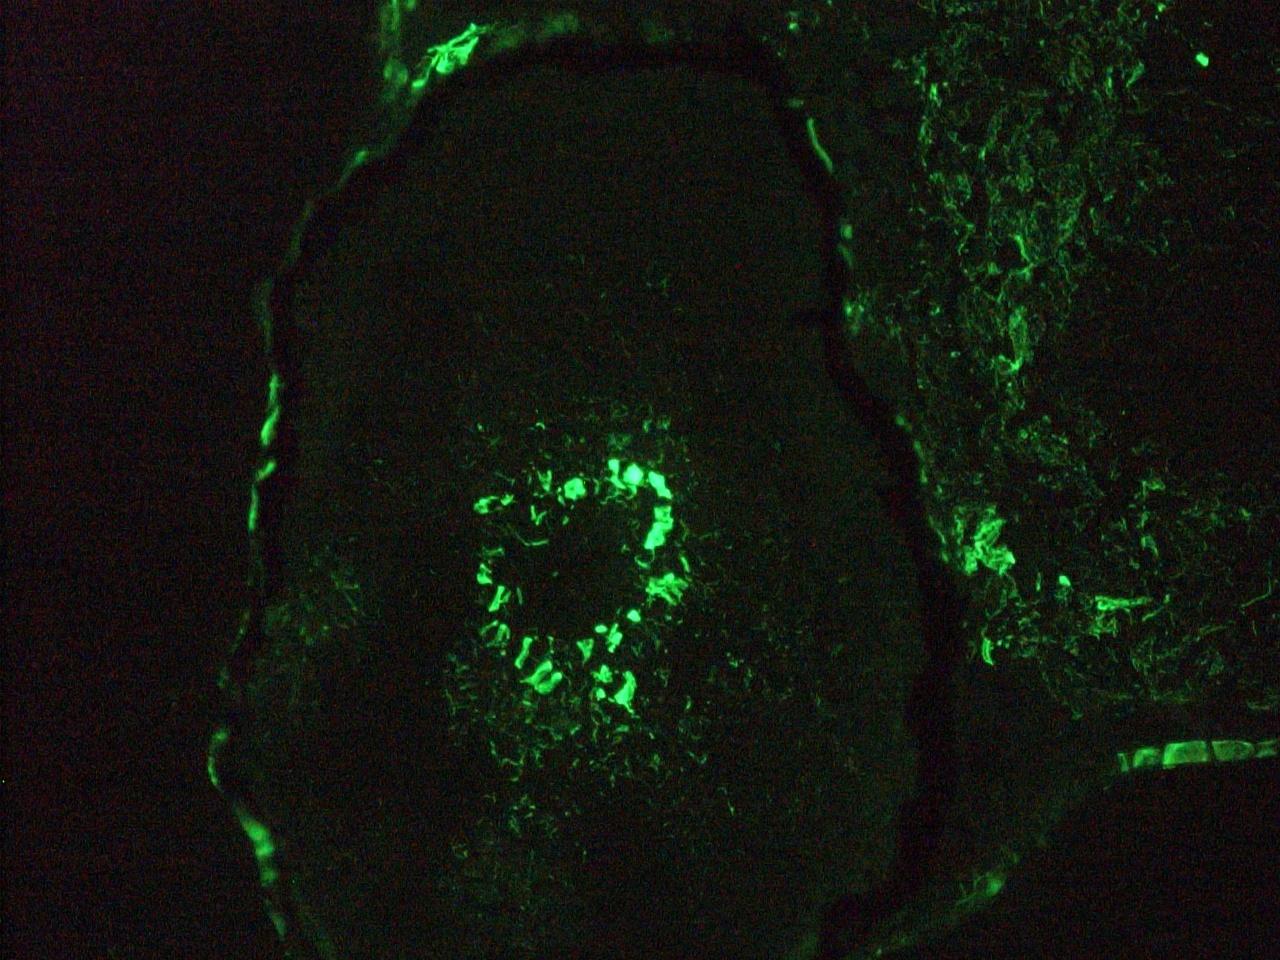 Figure 8. Immunohistochemistry on frozen section of zebra fish embryo